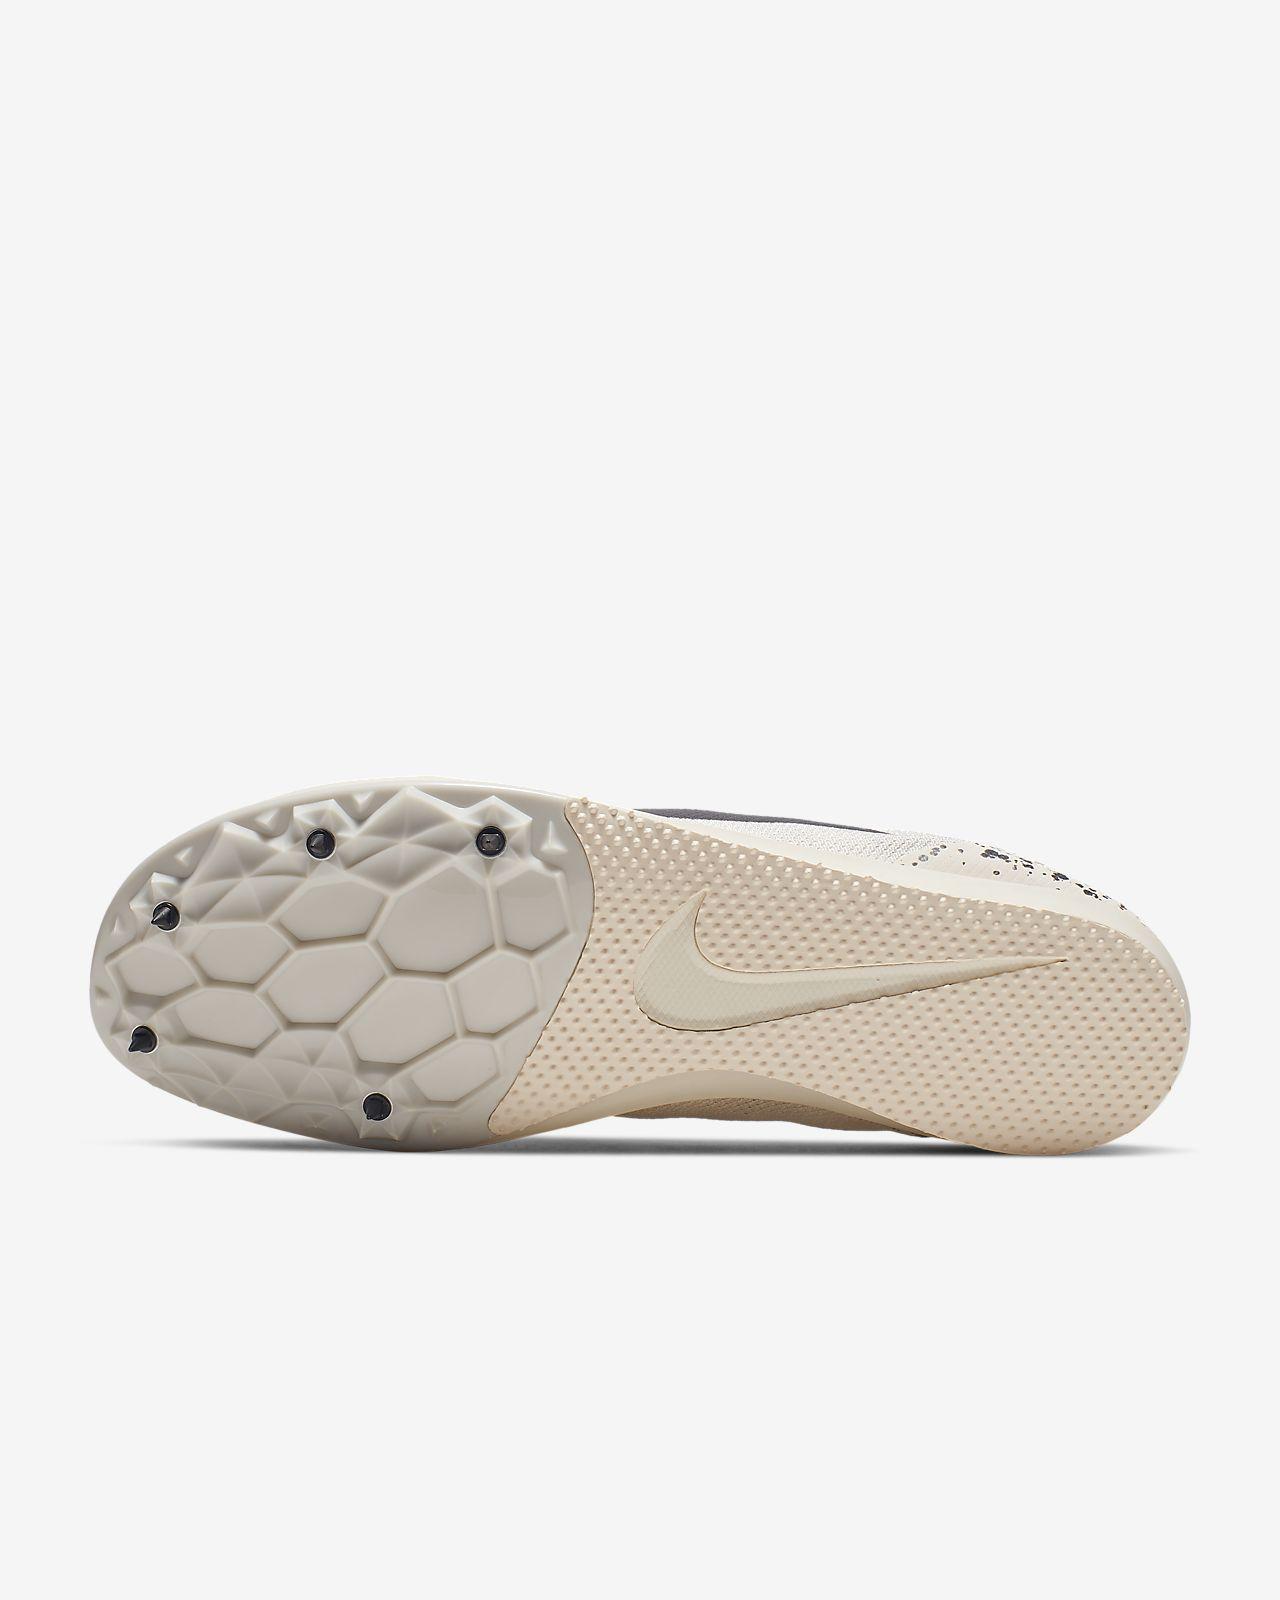 b84b5a65fdd71 Nike Zoom Rival D 10 Unisex Track Spike